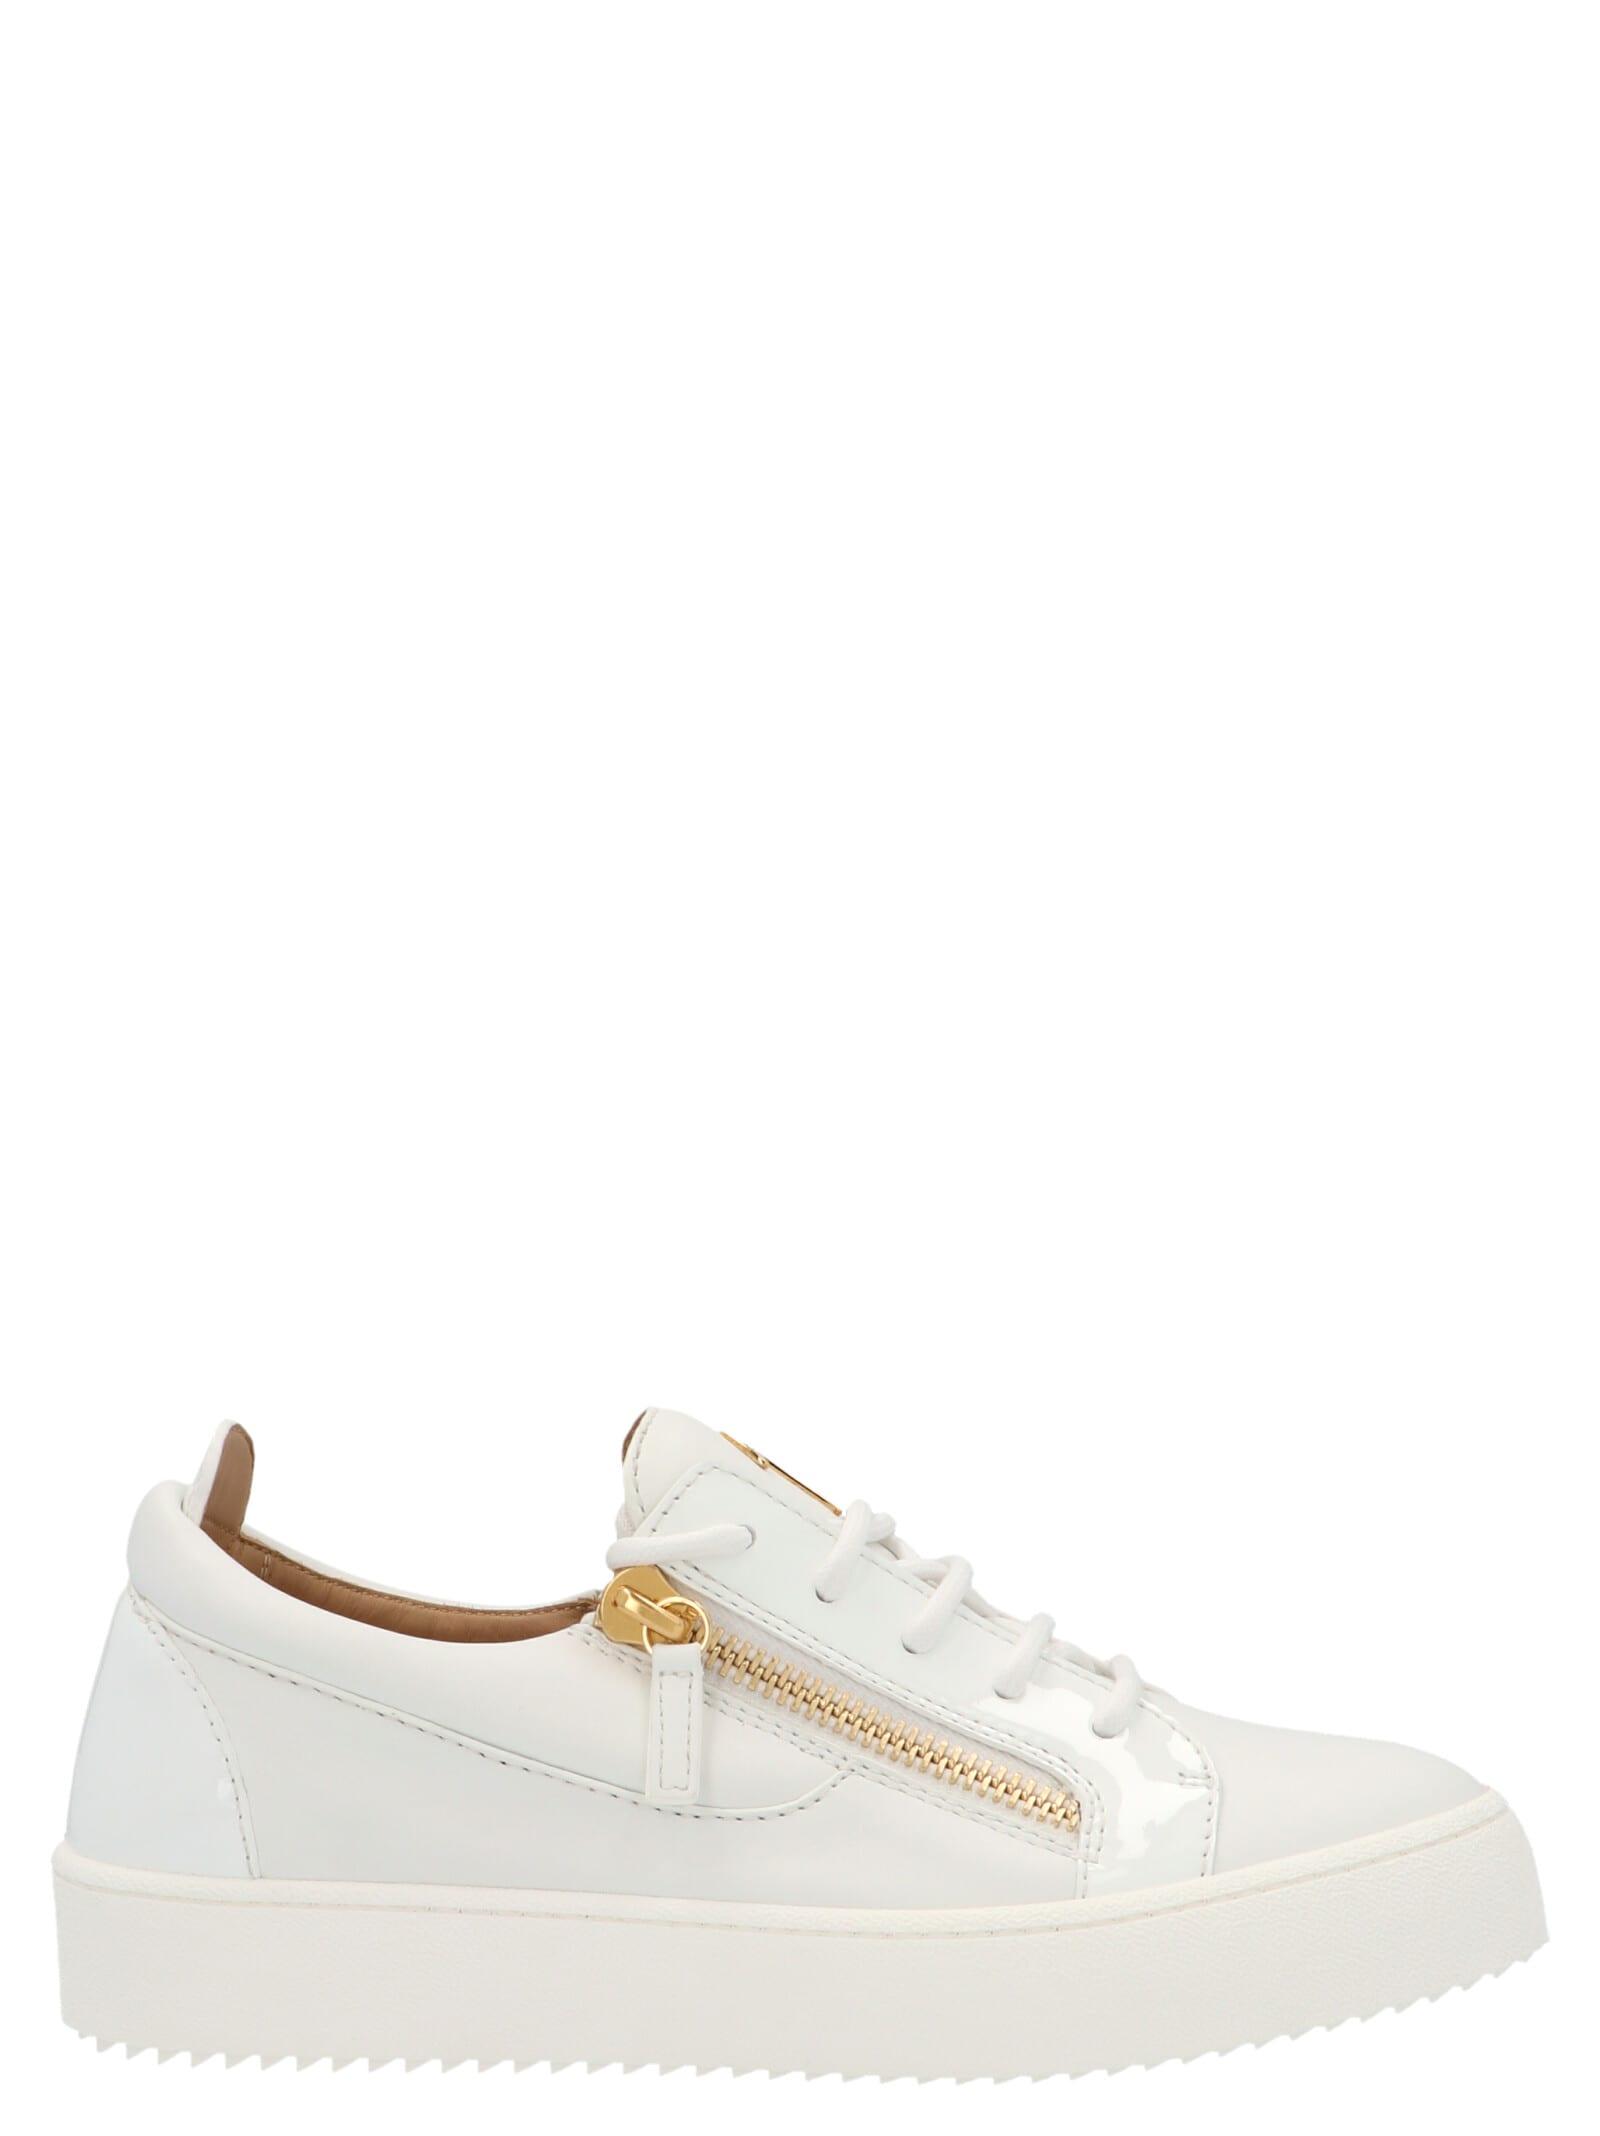 Giuseppe Zanotti may London Sneakers